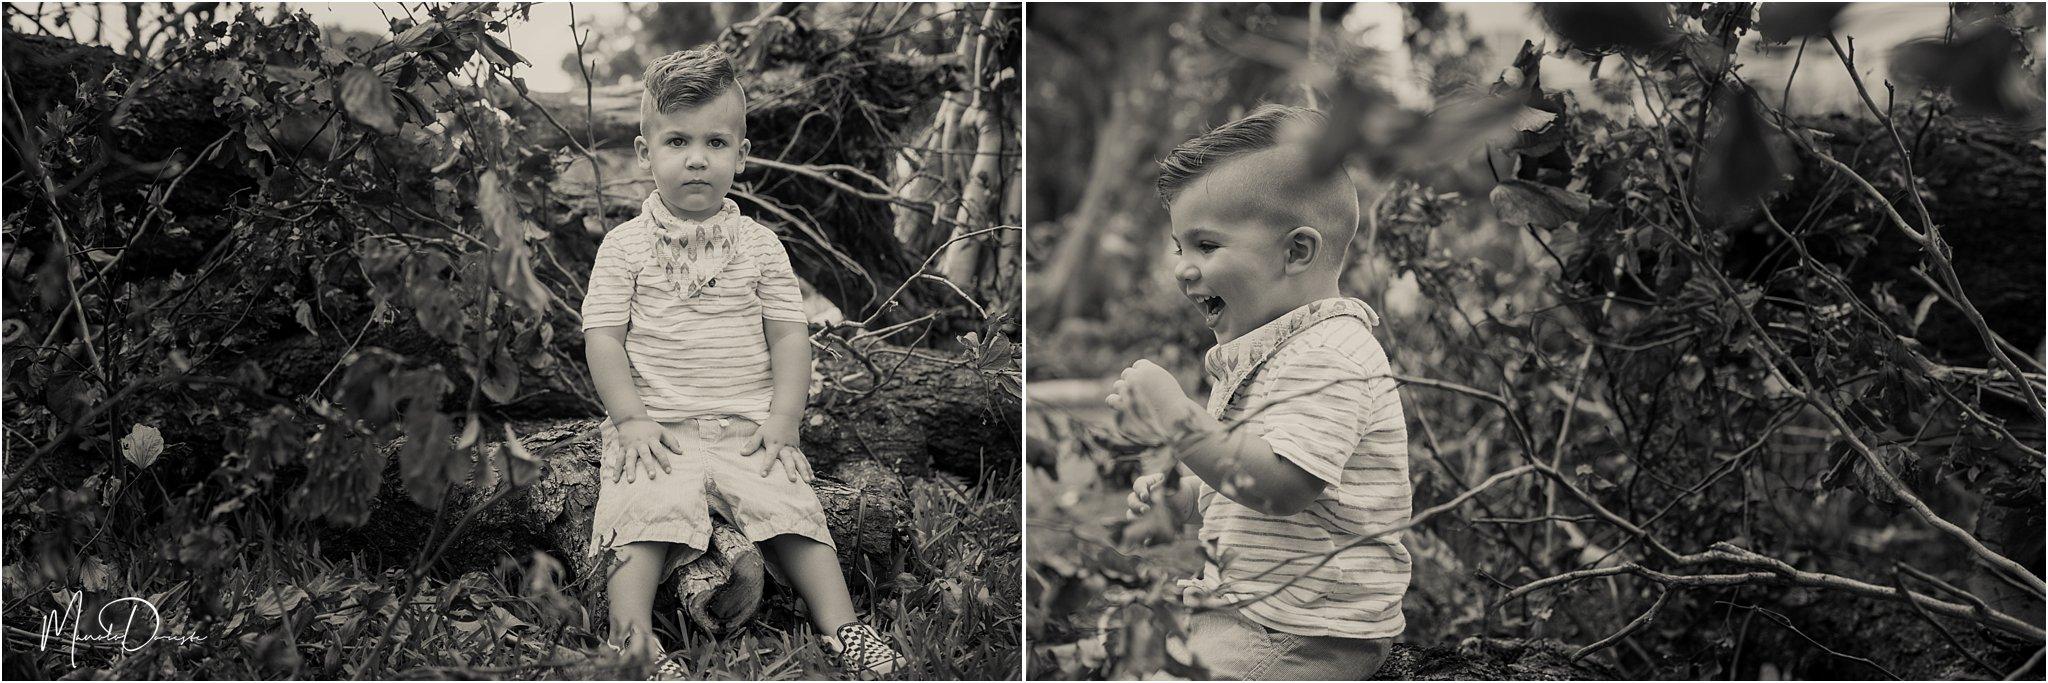 0203_ManoloDoreste_InFocusStudios_Wedding_Family_Photography_Miami_MiamiPhotographer.jpg